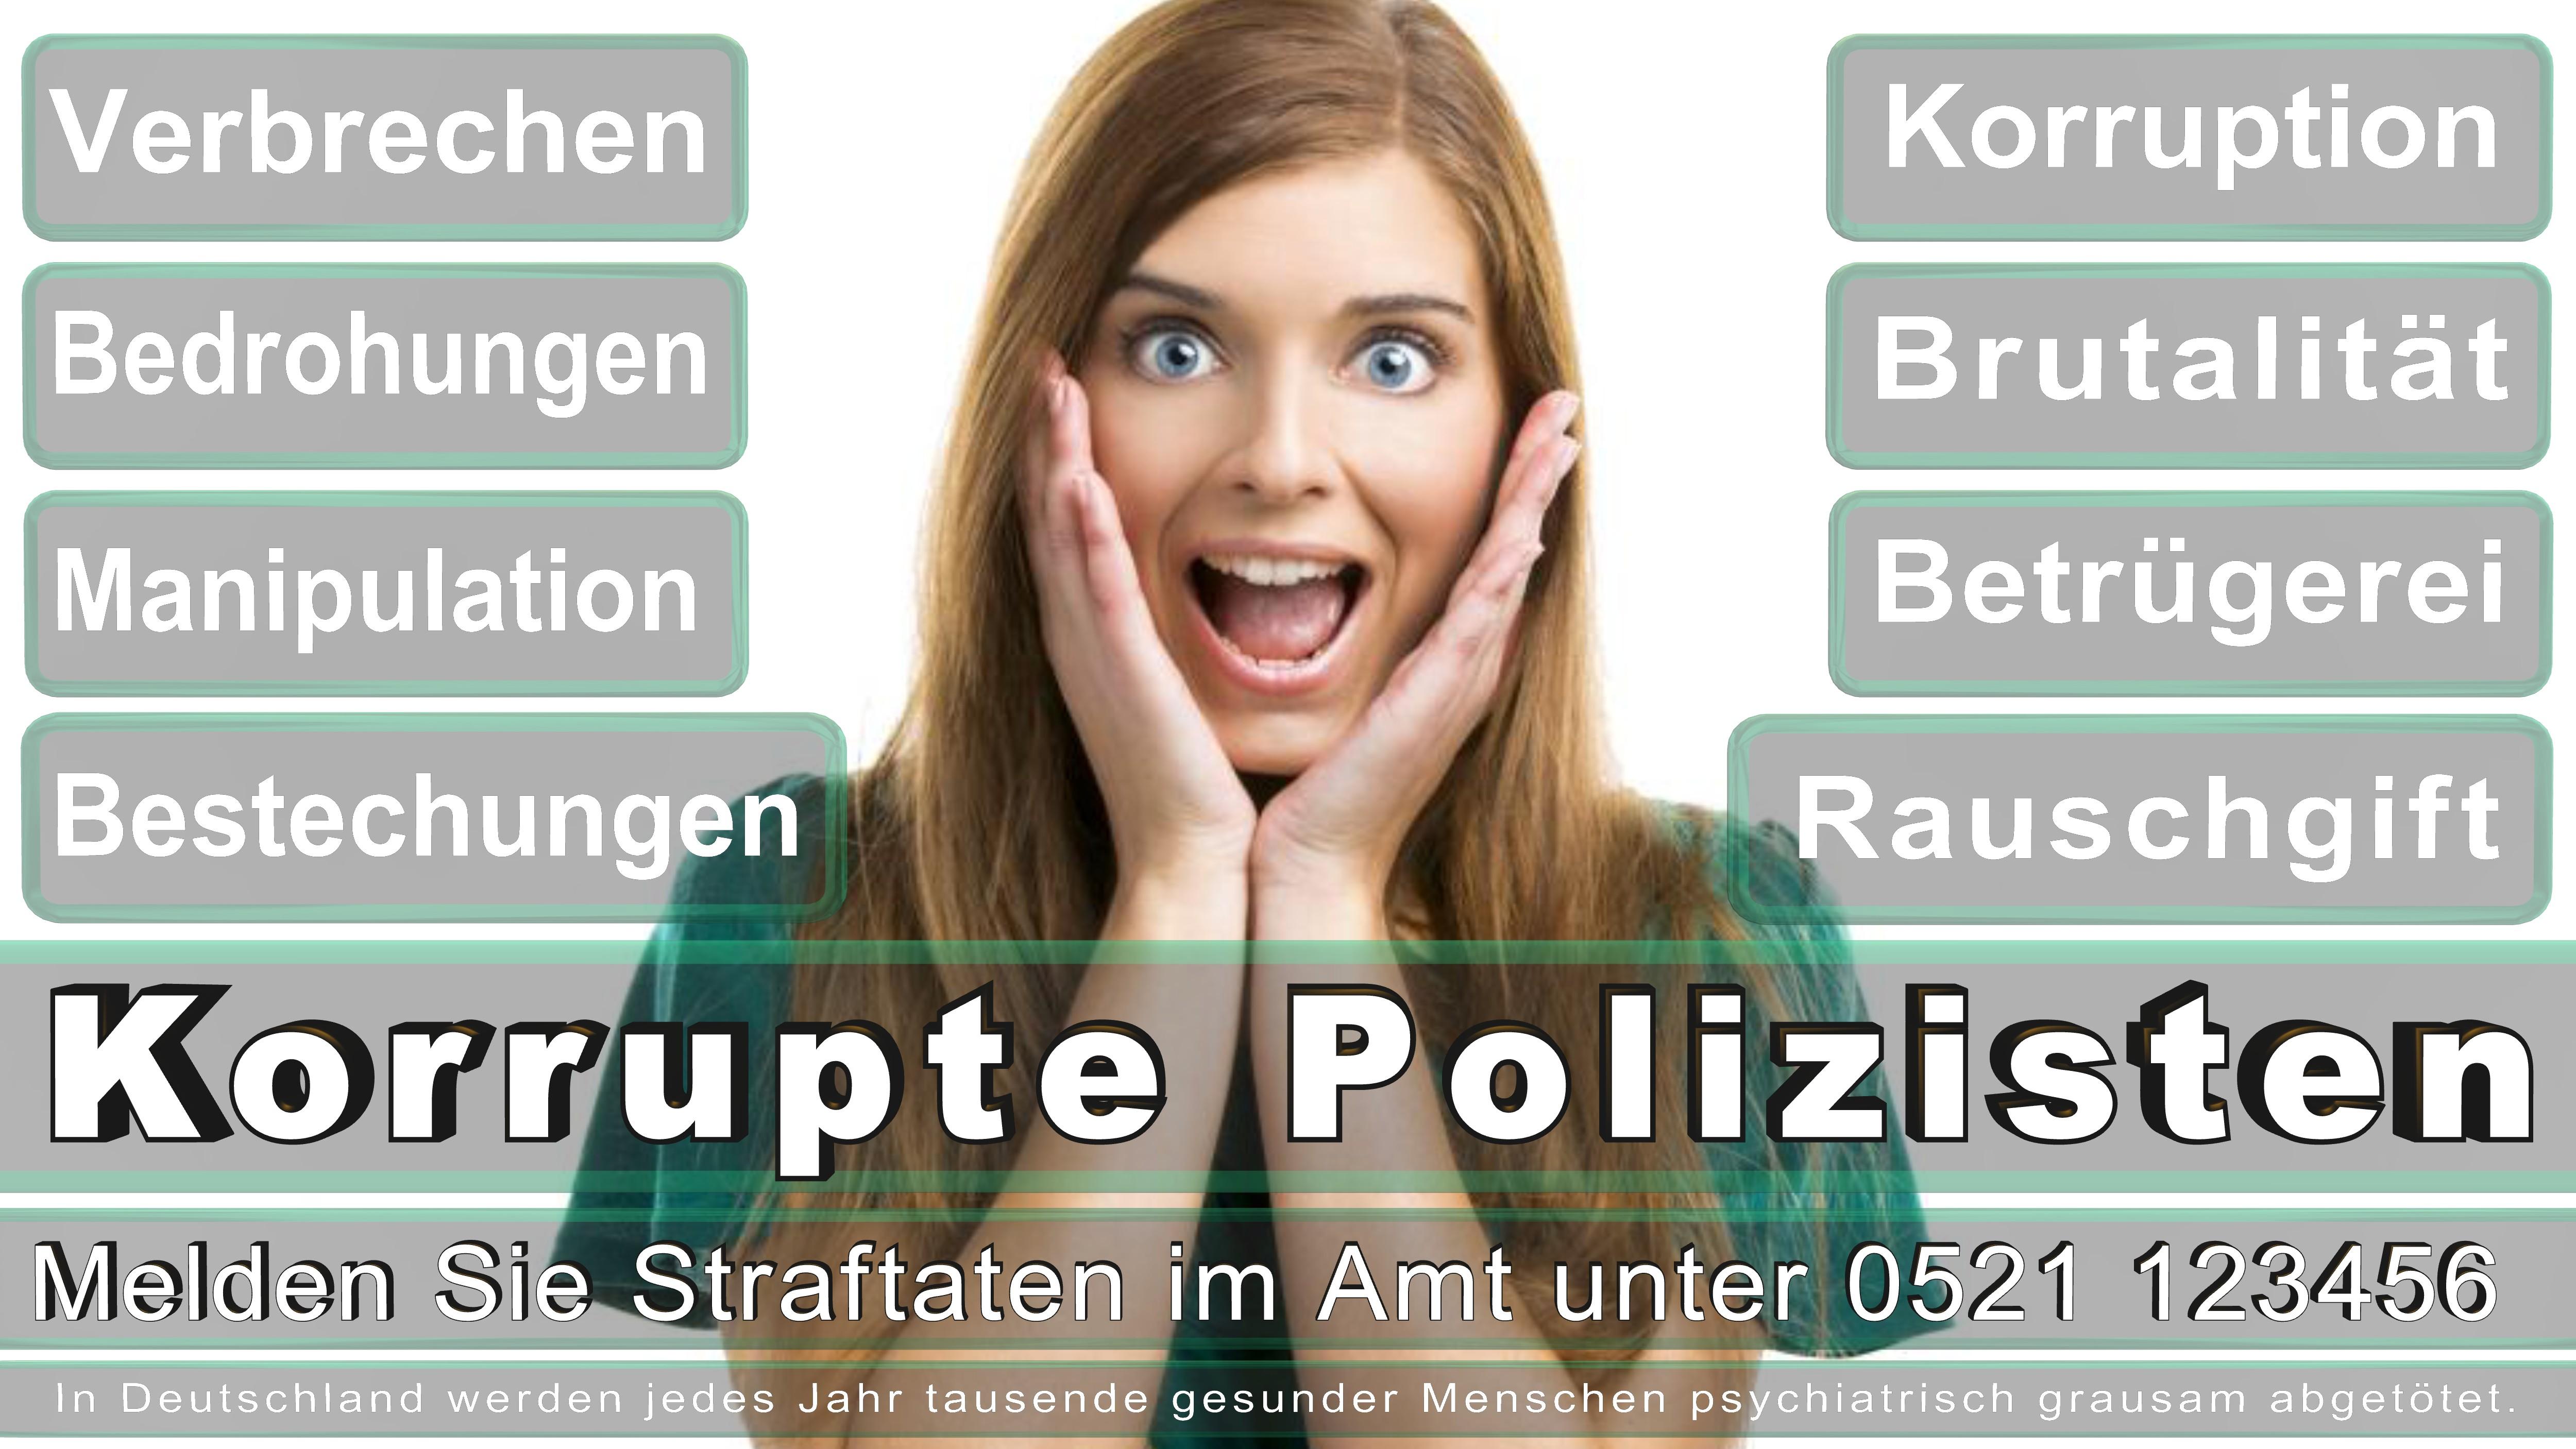 Polizei-Bielefeld-Polizei-Bielefeld-Polizei-Bielefeld (156)